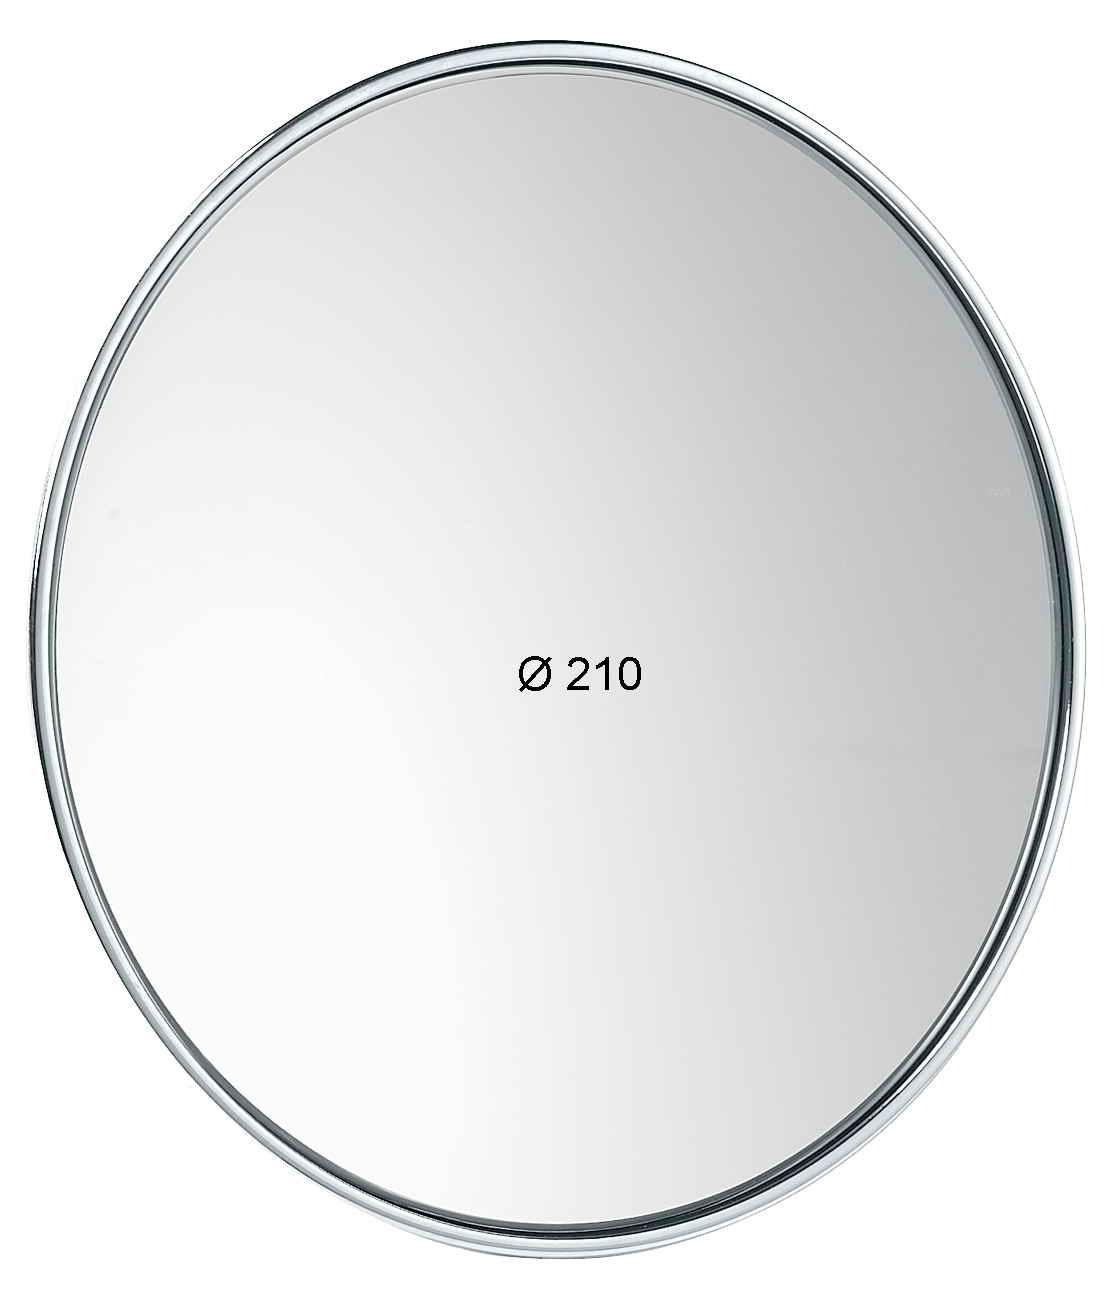 Specchio con ventose ingrandimento x6 diametro 210 cod - Specchio ingrandimento ...